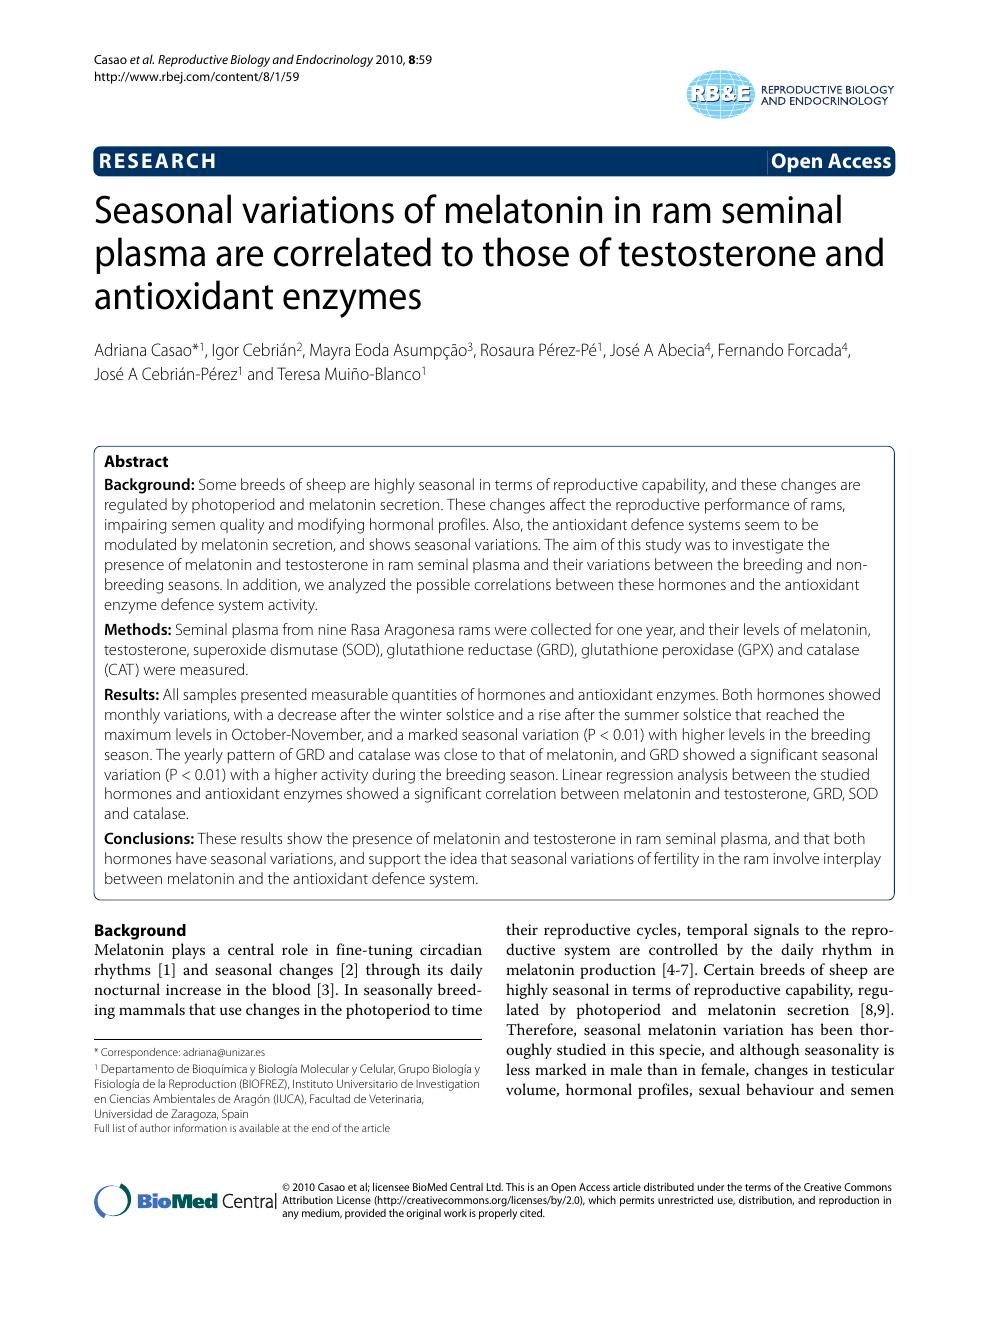 Seasonal variations of melatonin in ram seminal plasma are